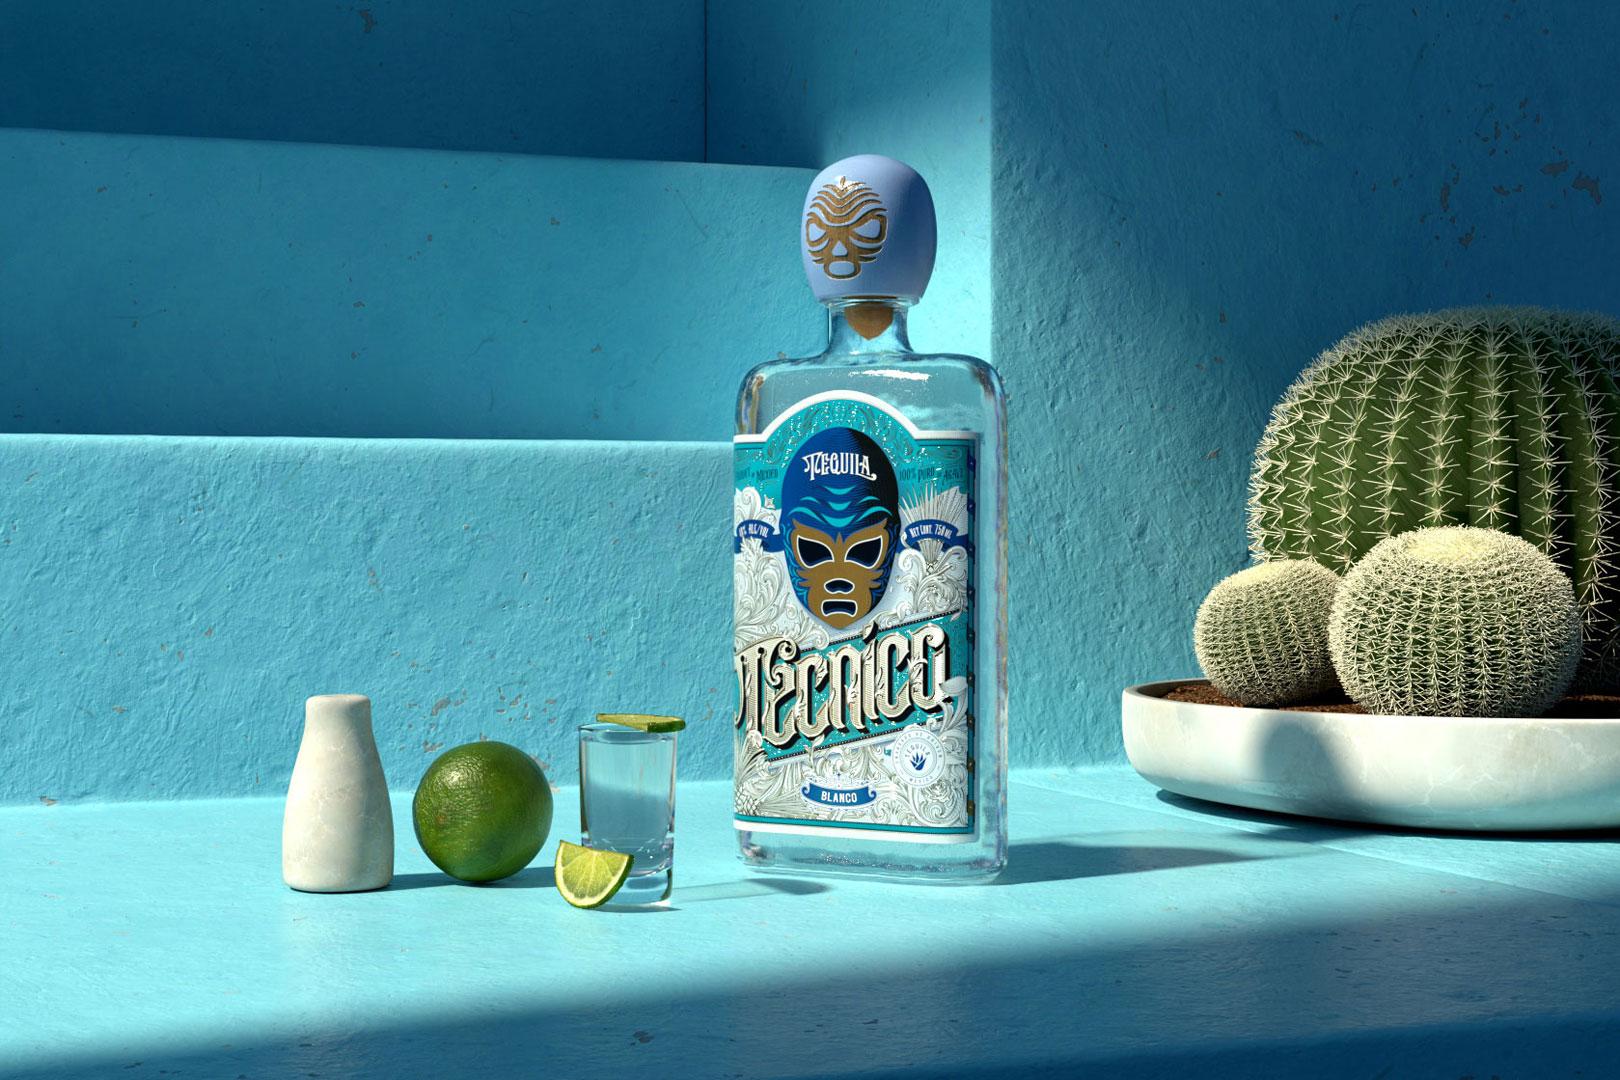 Silberner Tequila Tecnico